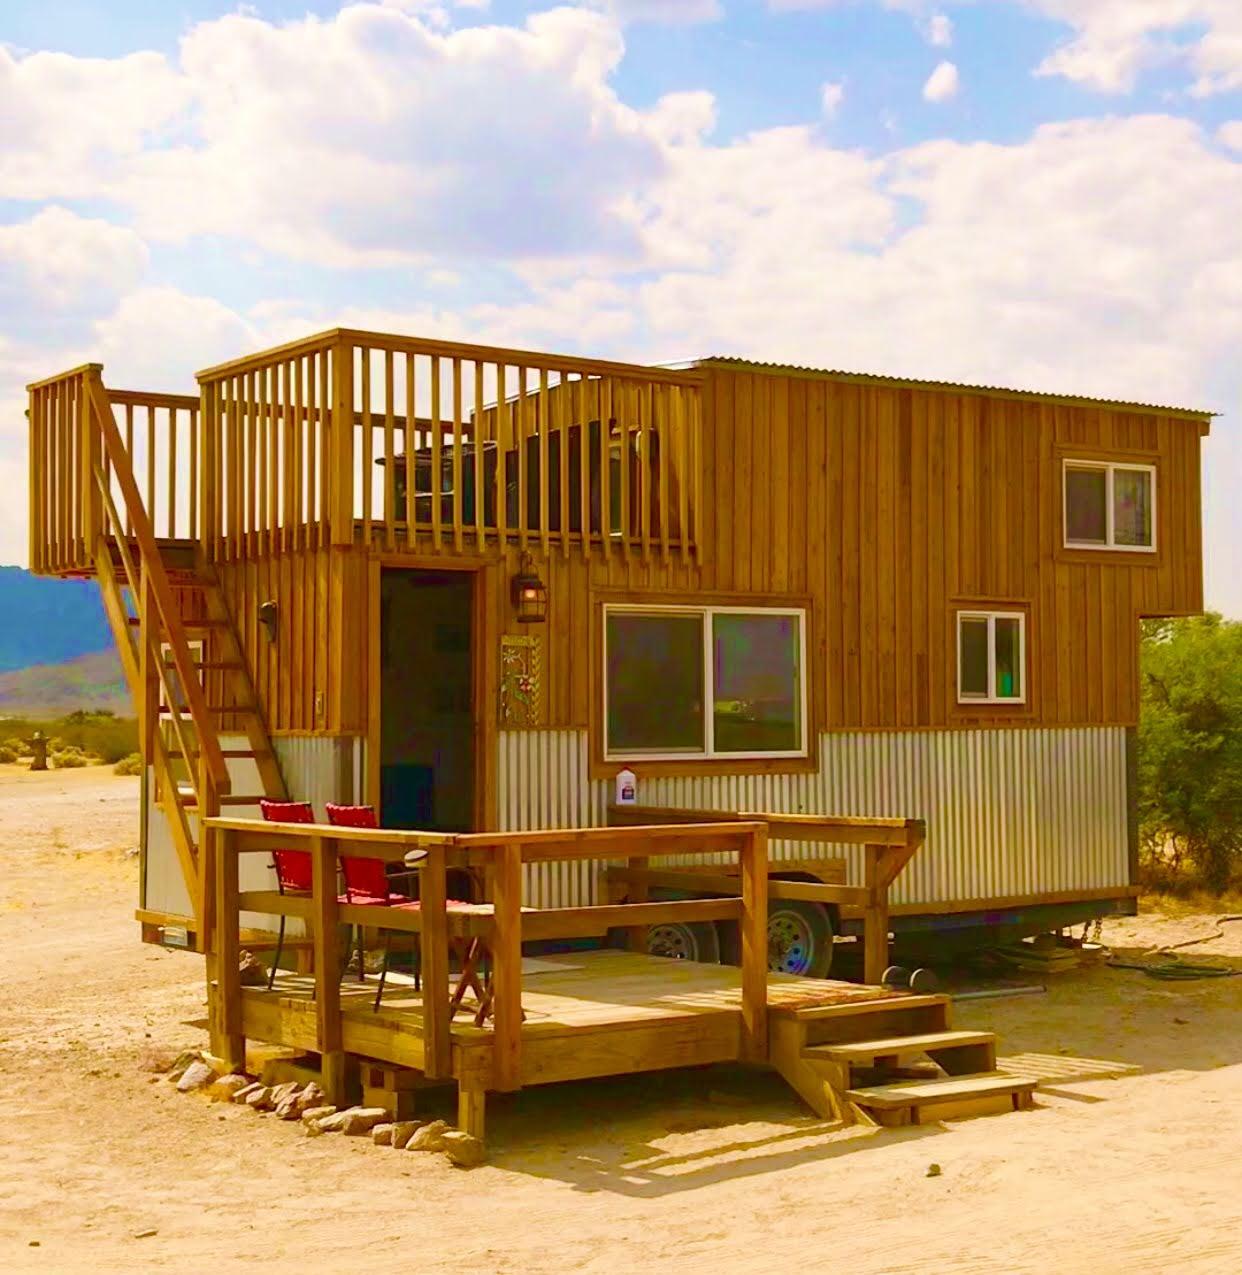 tiny travel chick tiny house getaways sandy valley nevada